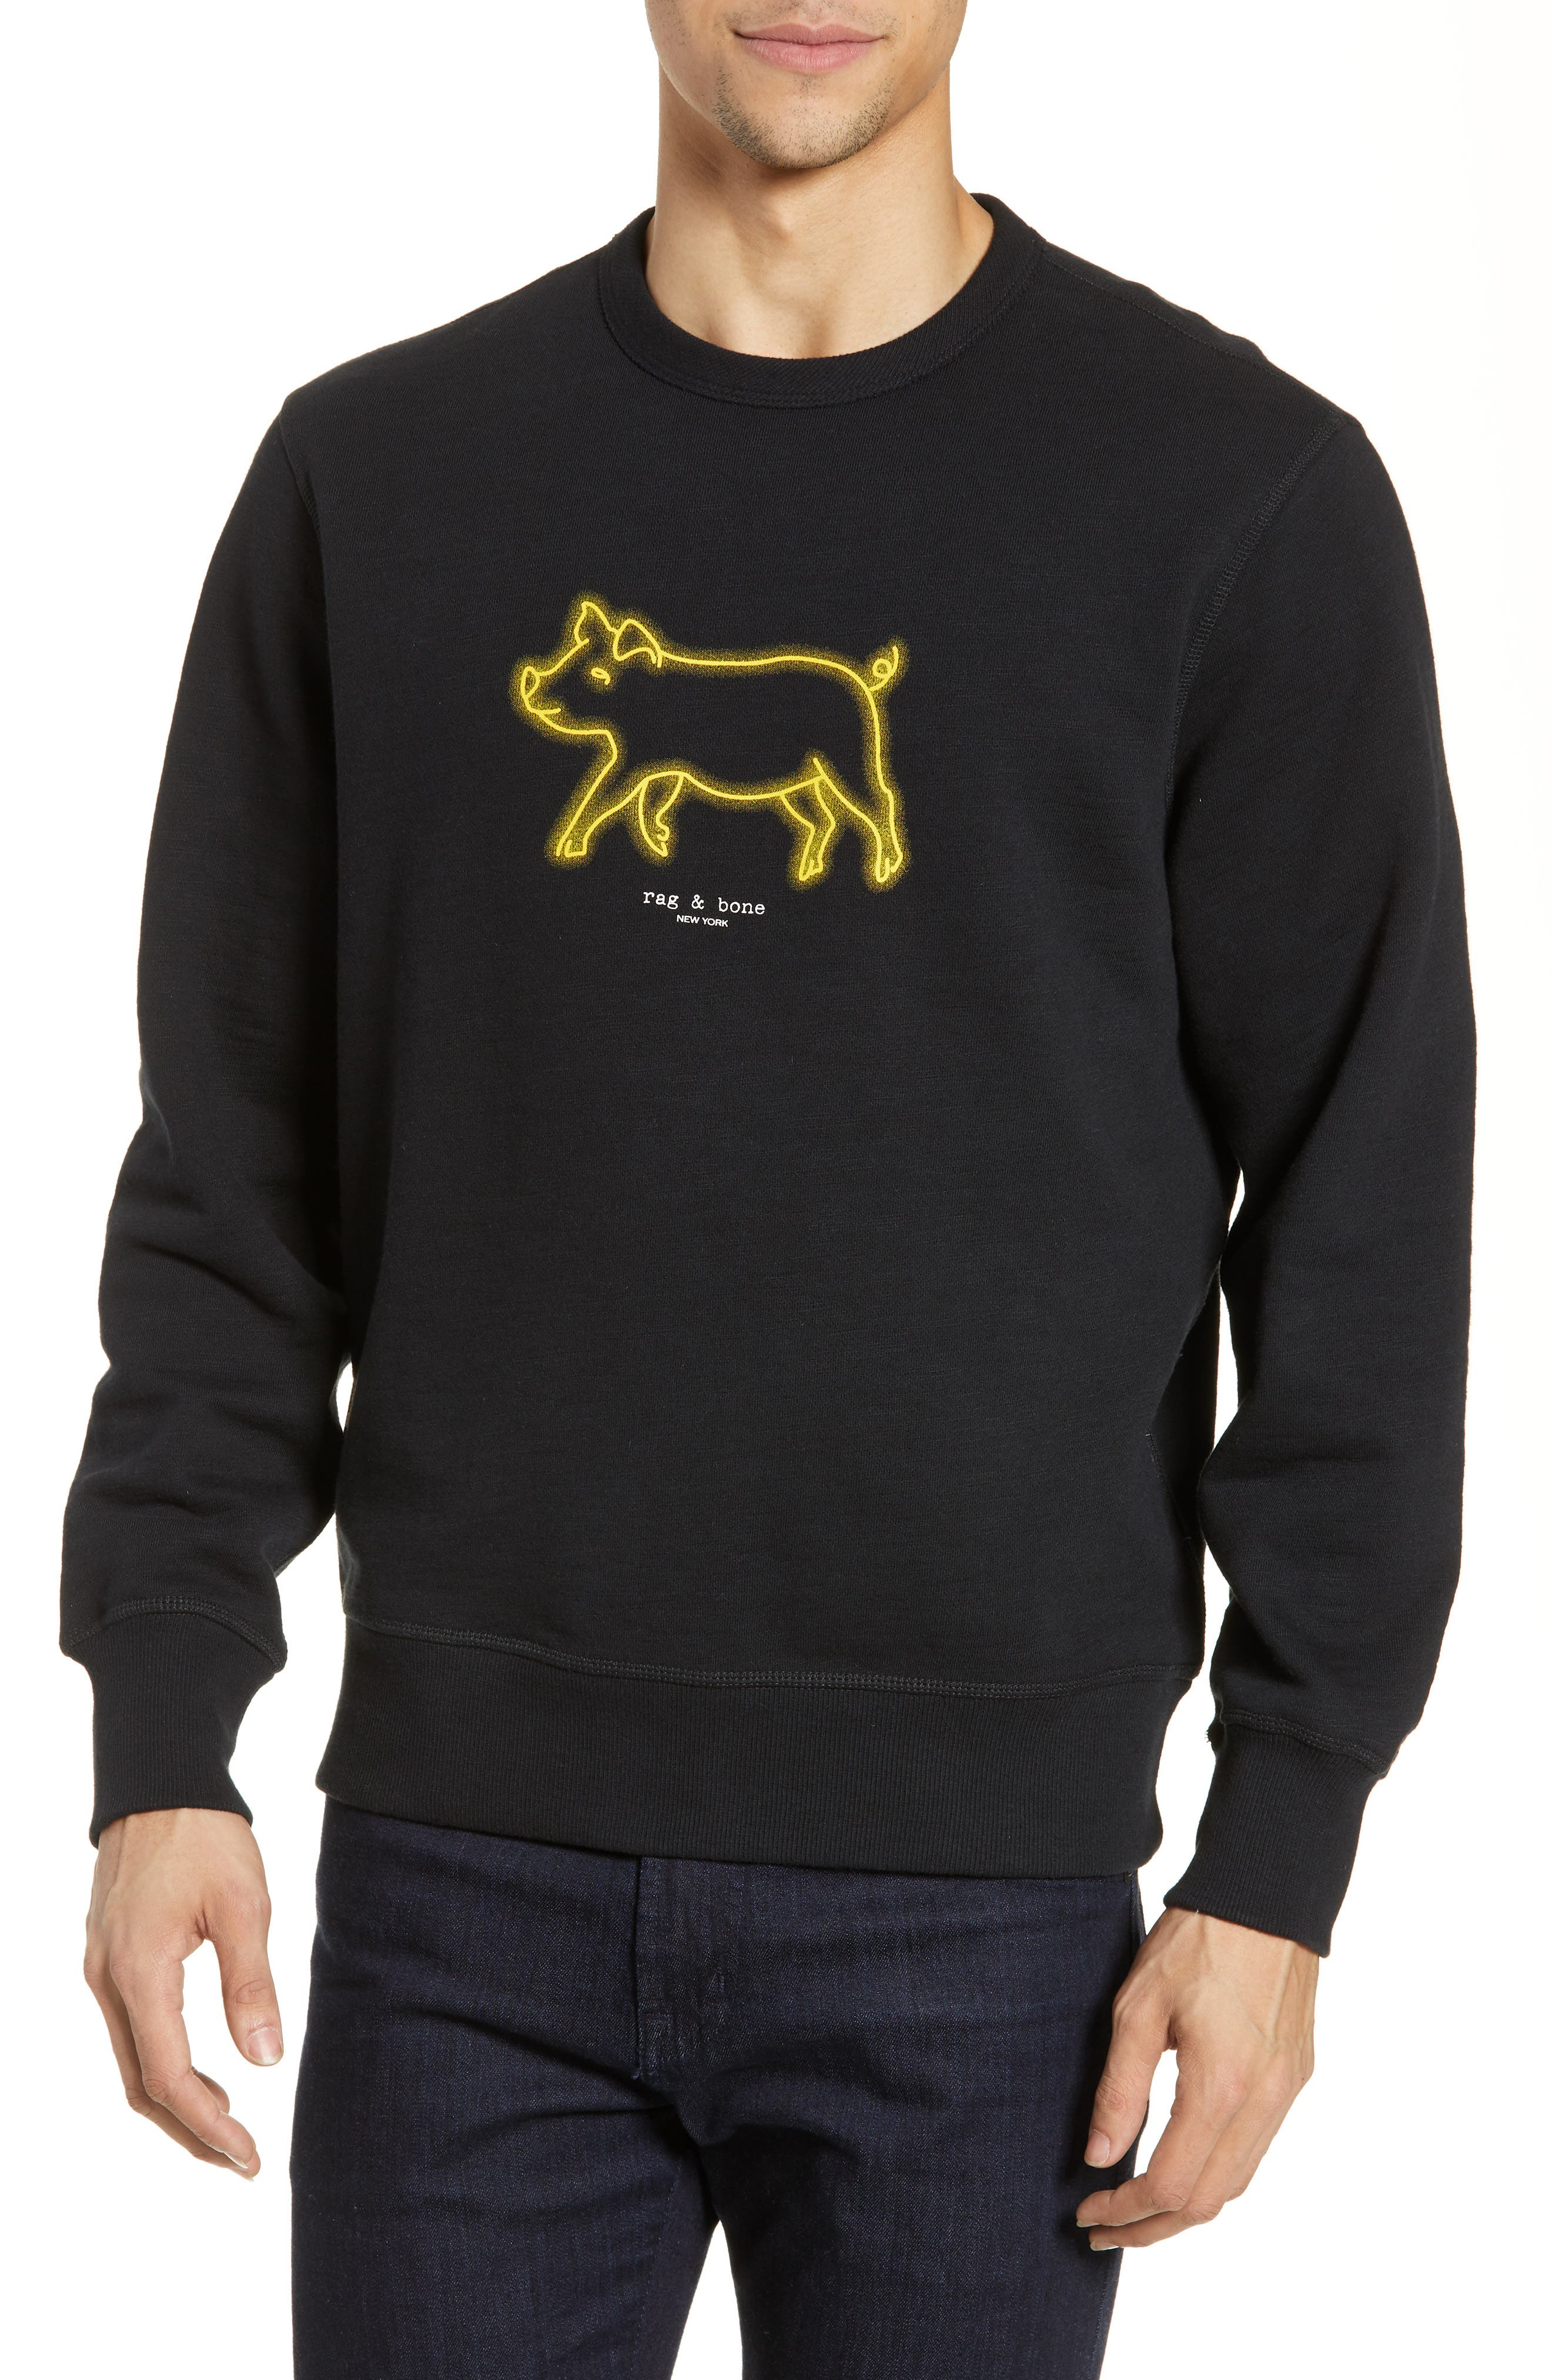 RAG & BONE, Year of the Pig Graphic Sweatshirt, Main thumbnail 1, color, BLACK